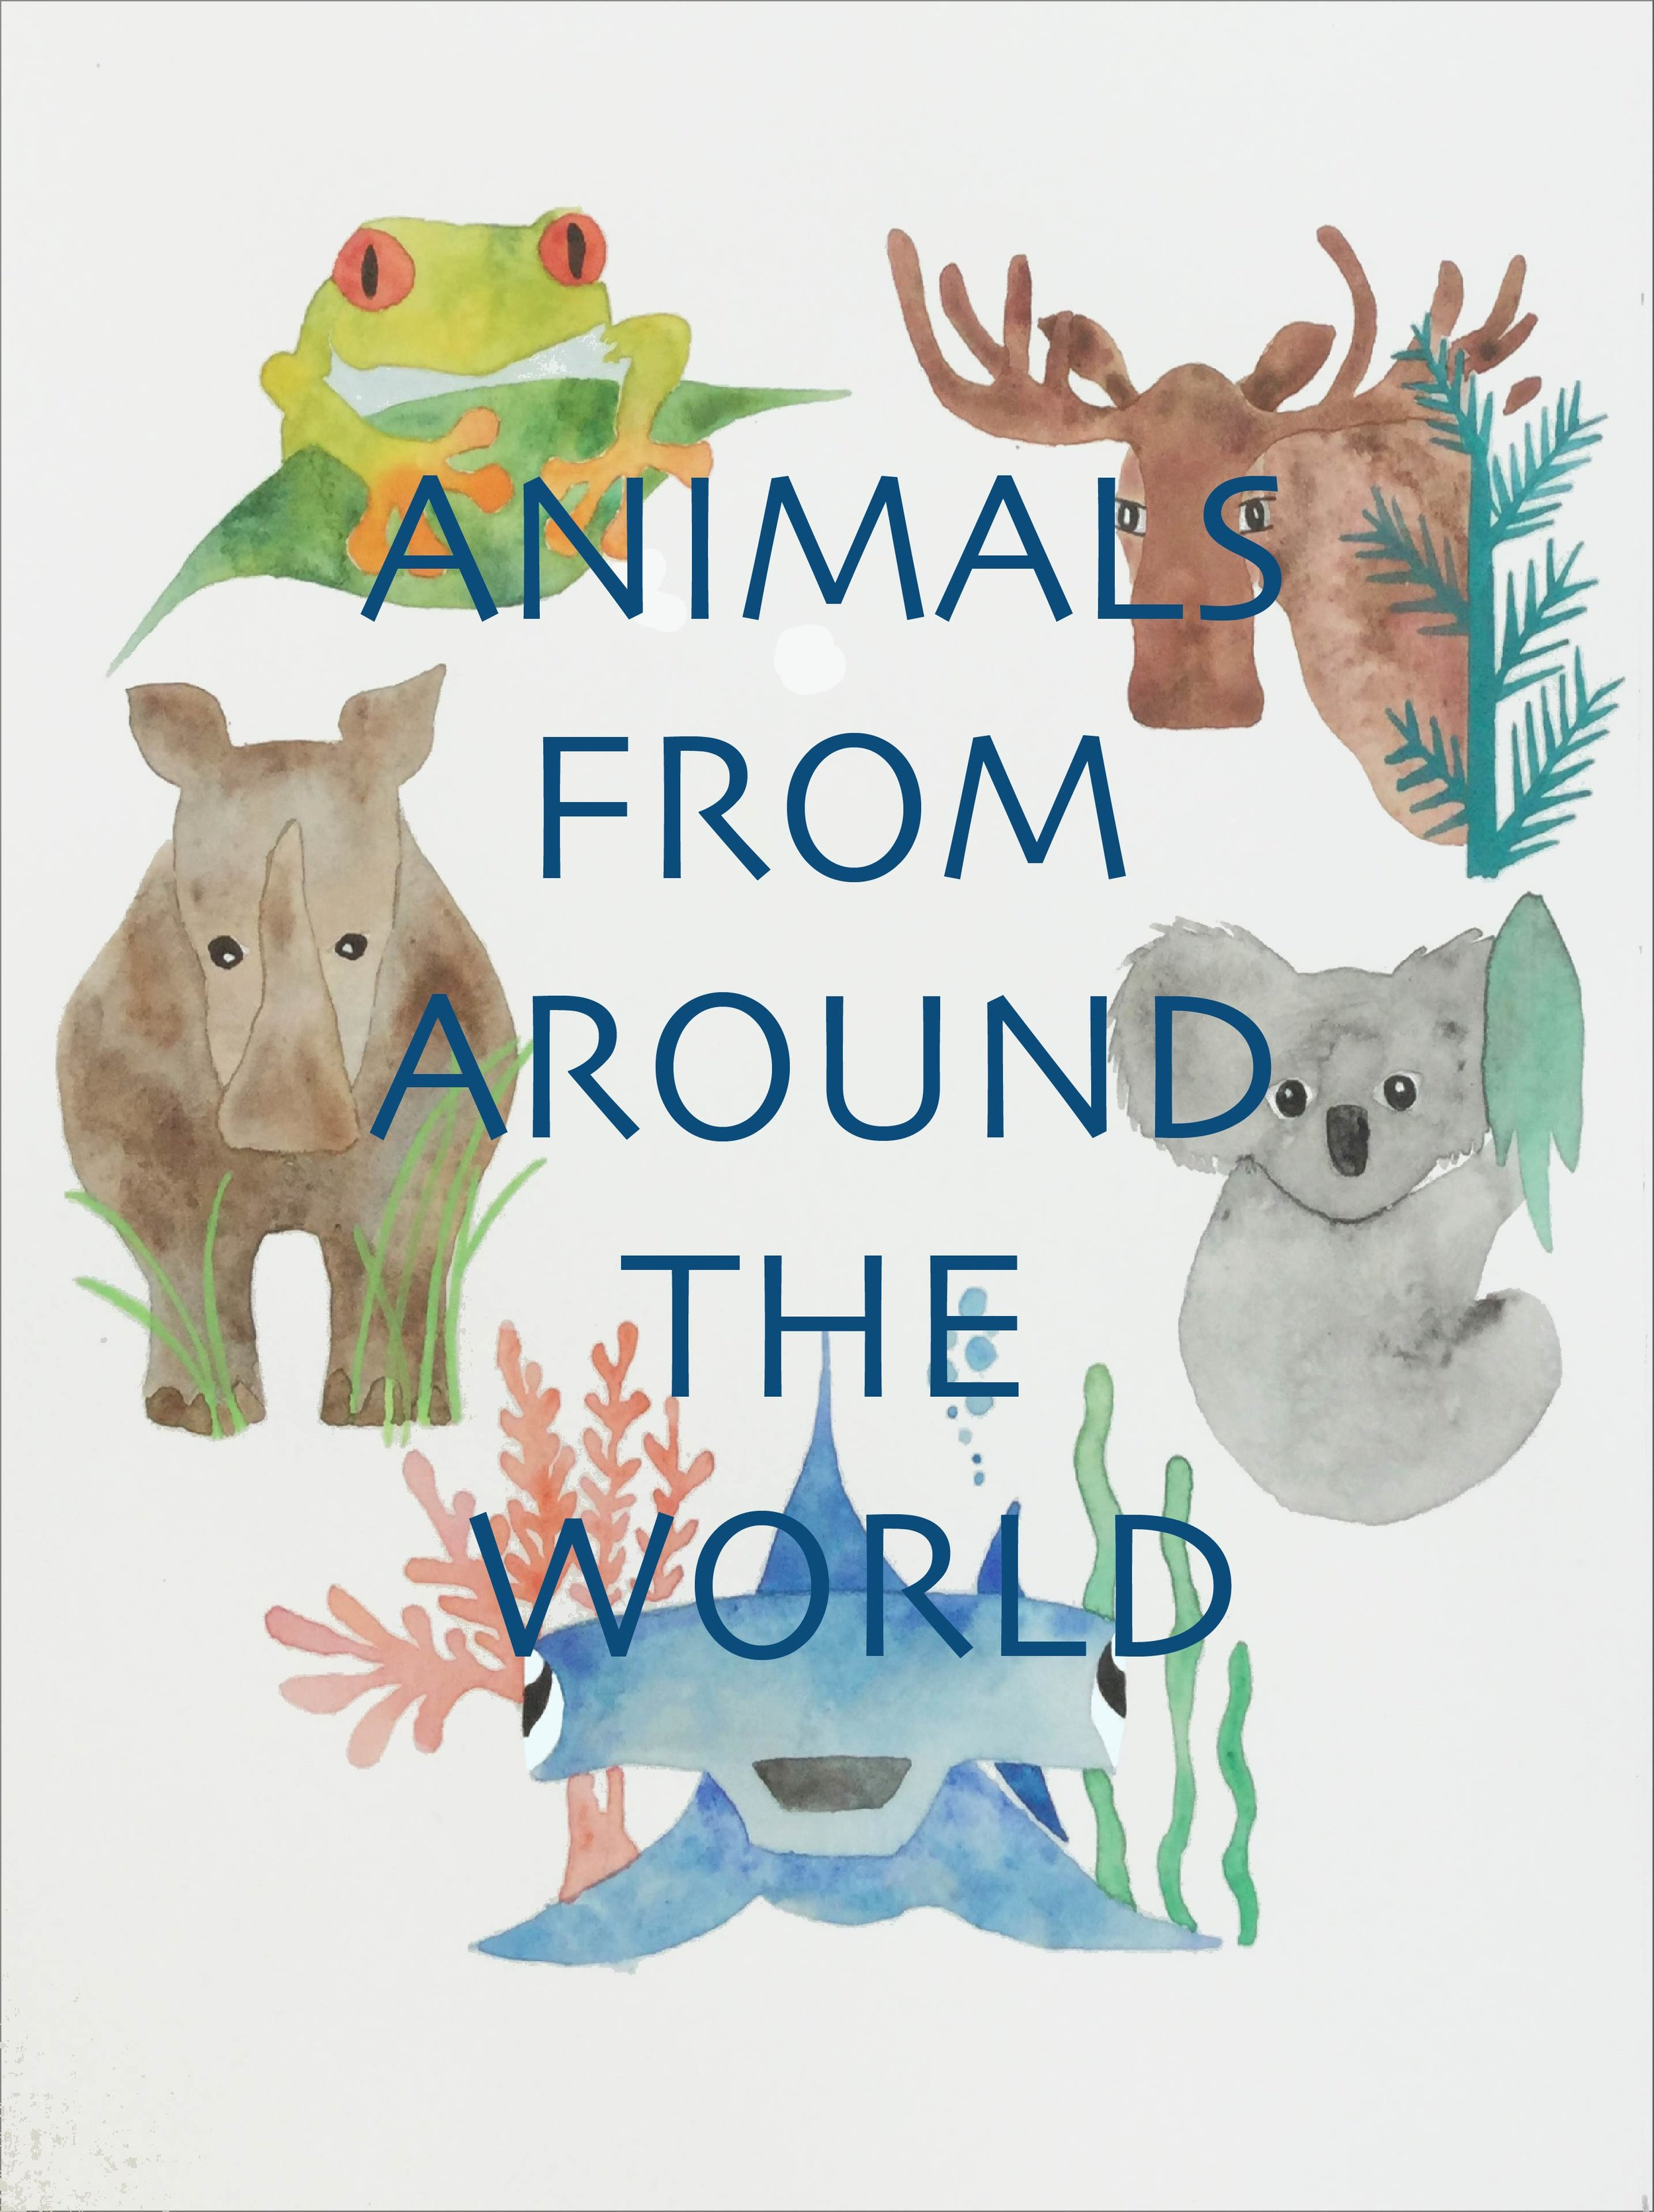 ANIMAL COVER 1F-01.jpg